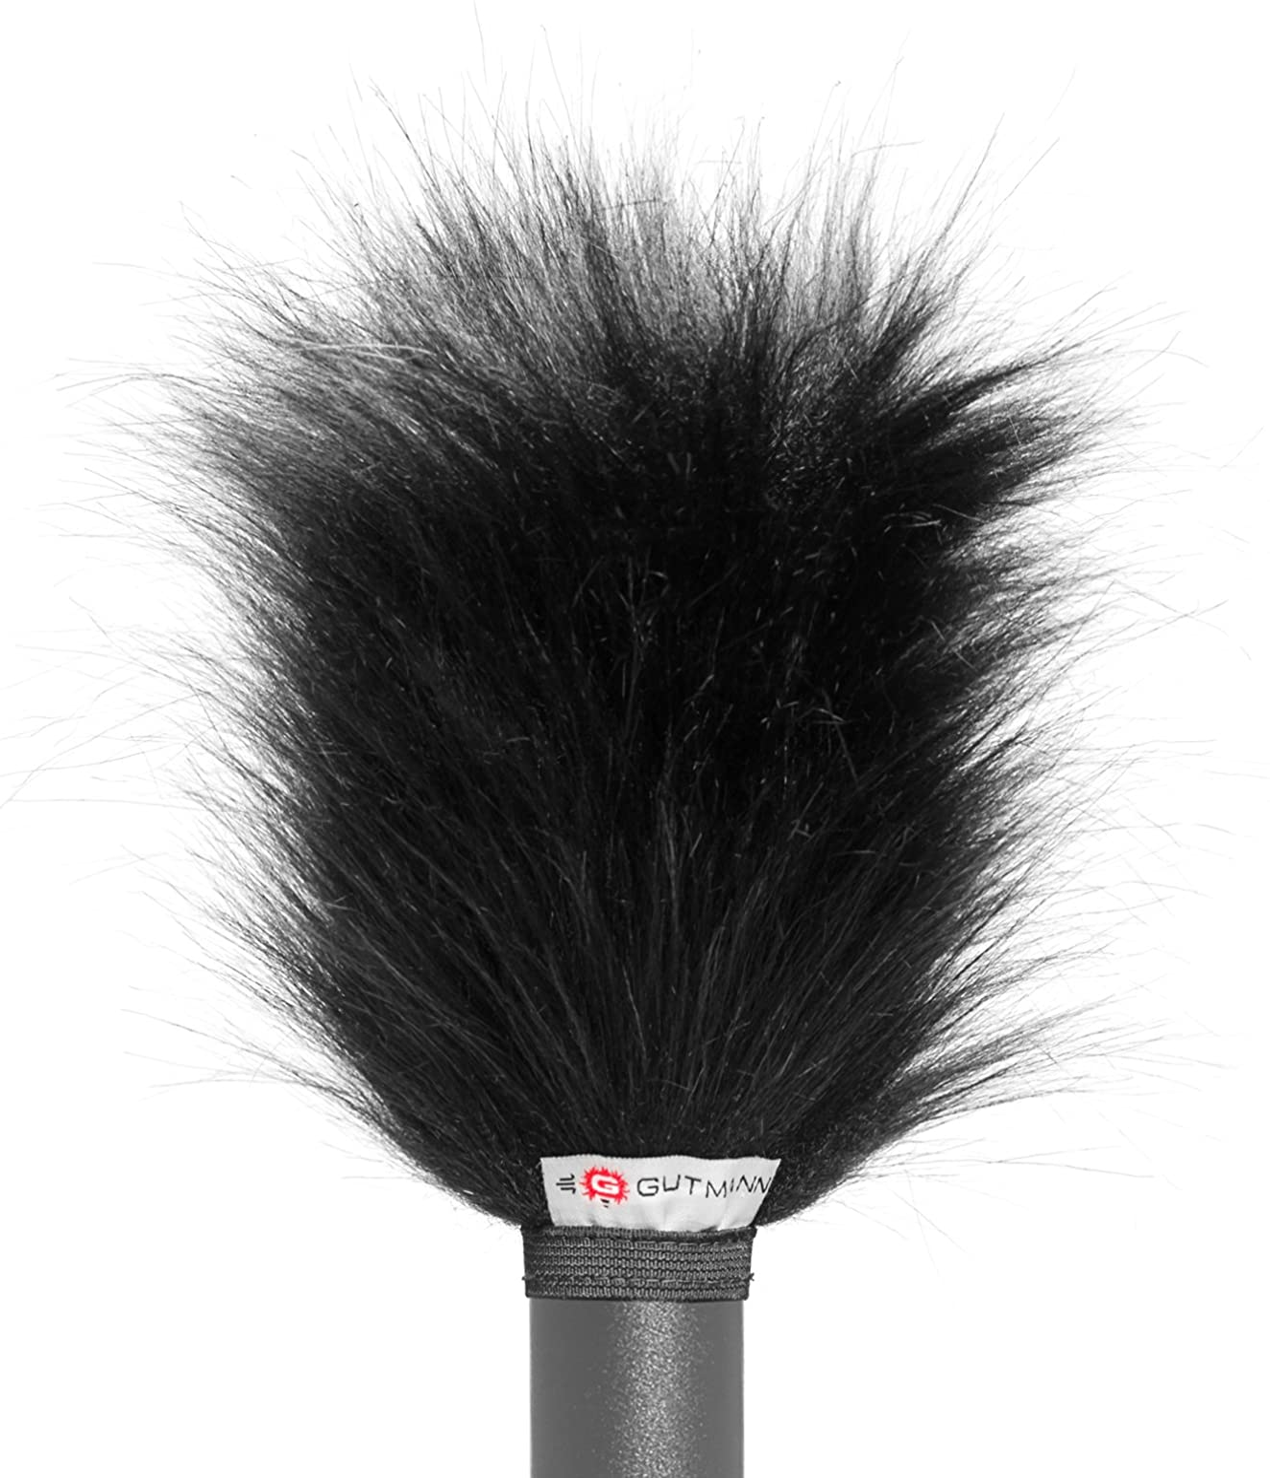 Gutmann Microphone Fur Windscreen MKH Manufacturer Sale item OFFicial shop for Sennheiser Windshield